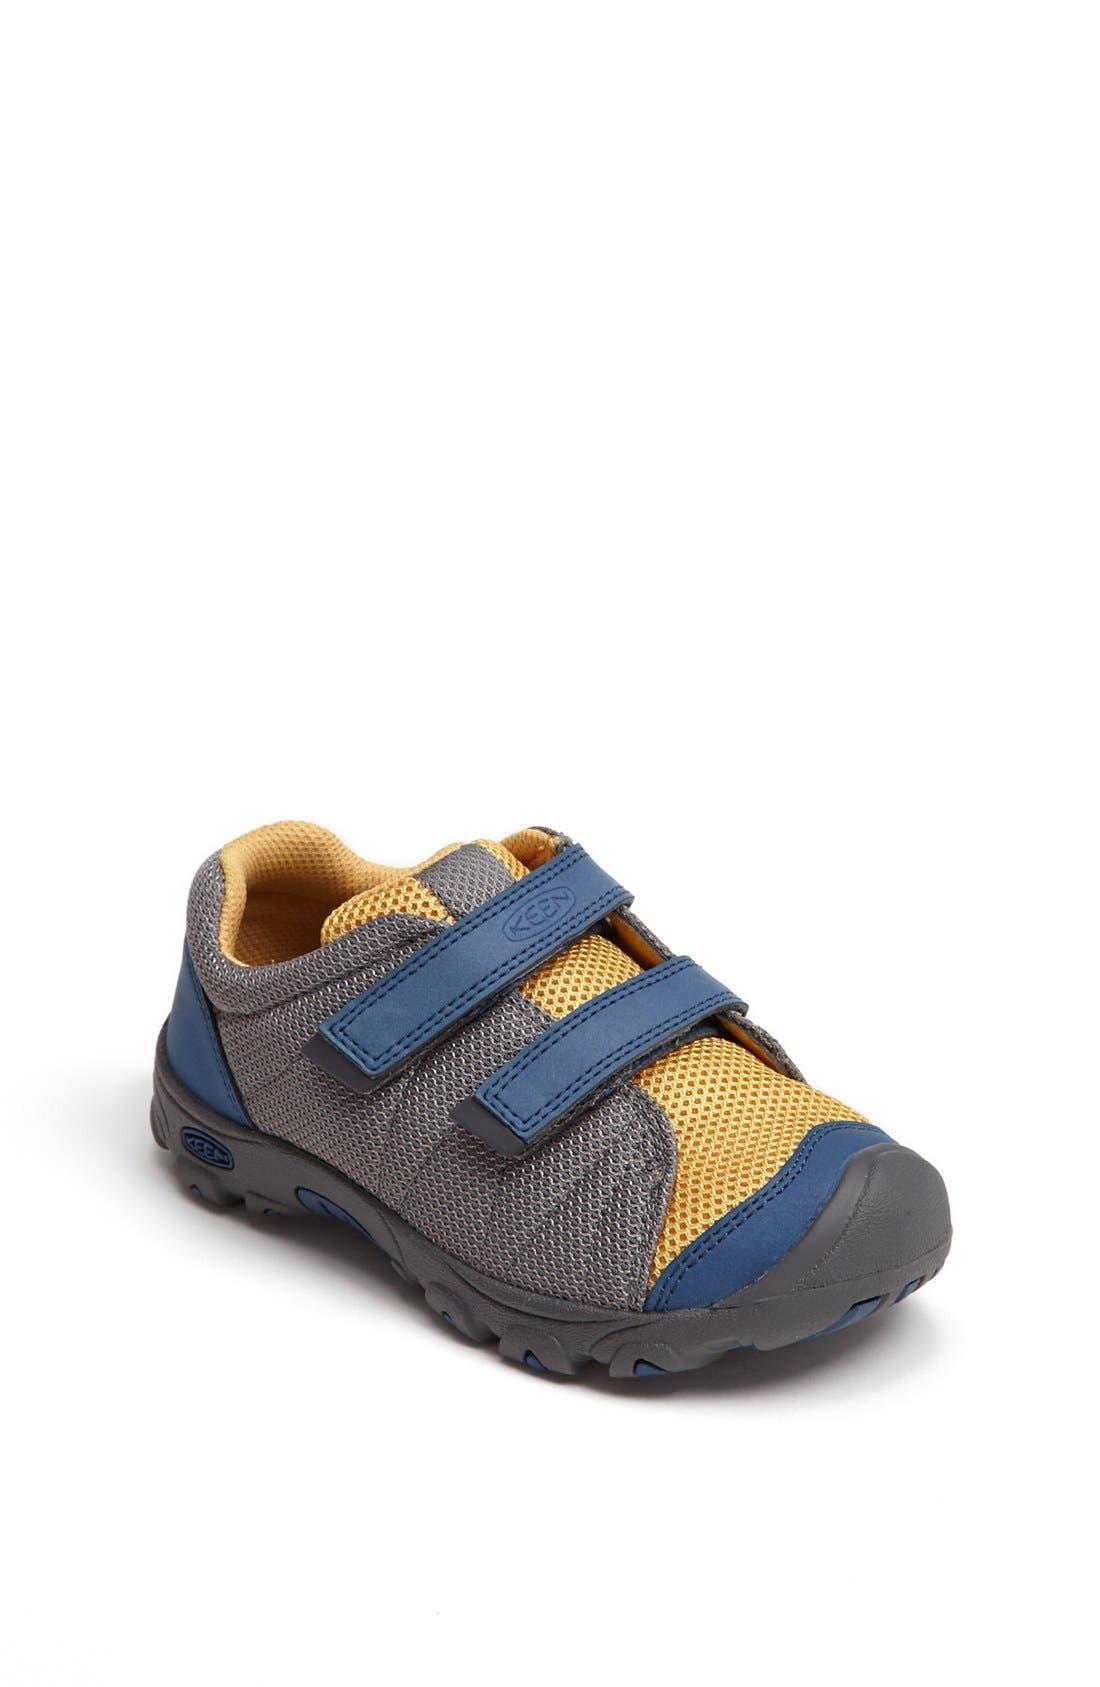 Main Image - Keen 'Riggins' Sneaker (Baby, Walker, Toddler & Little Kid)